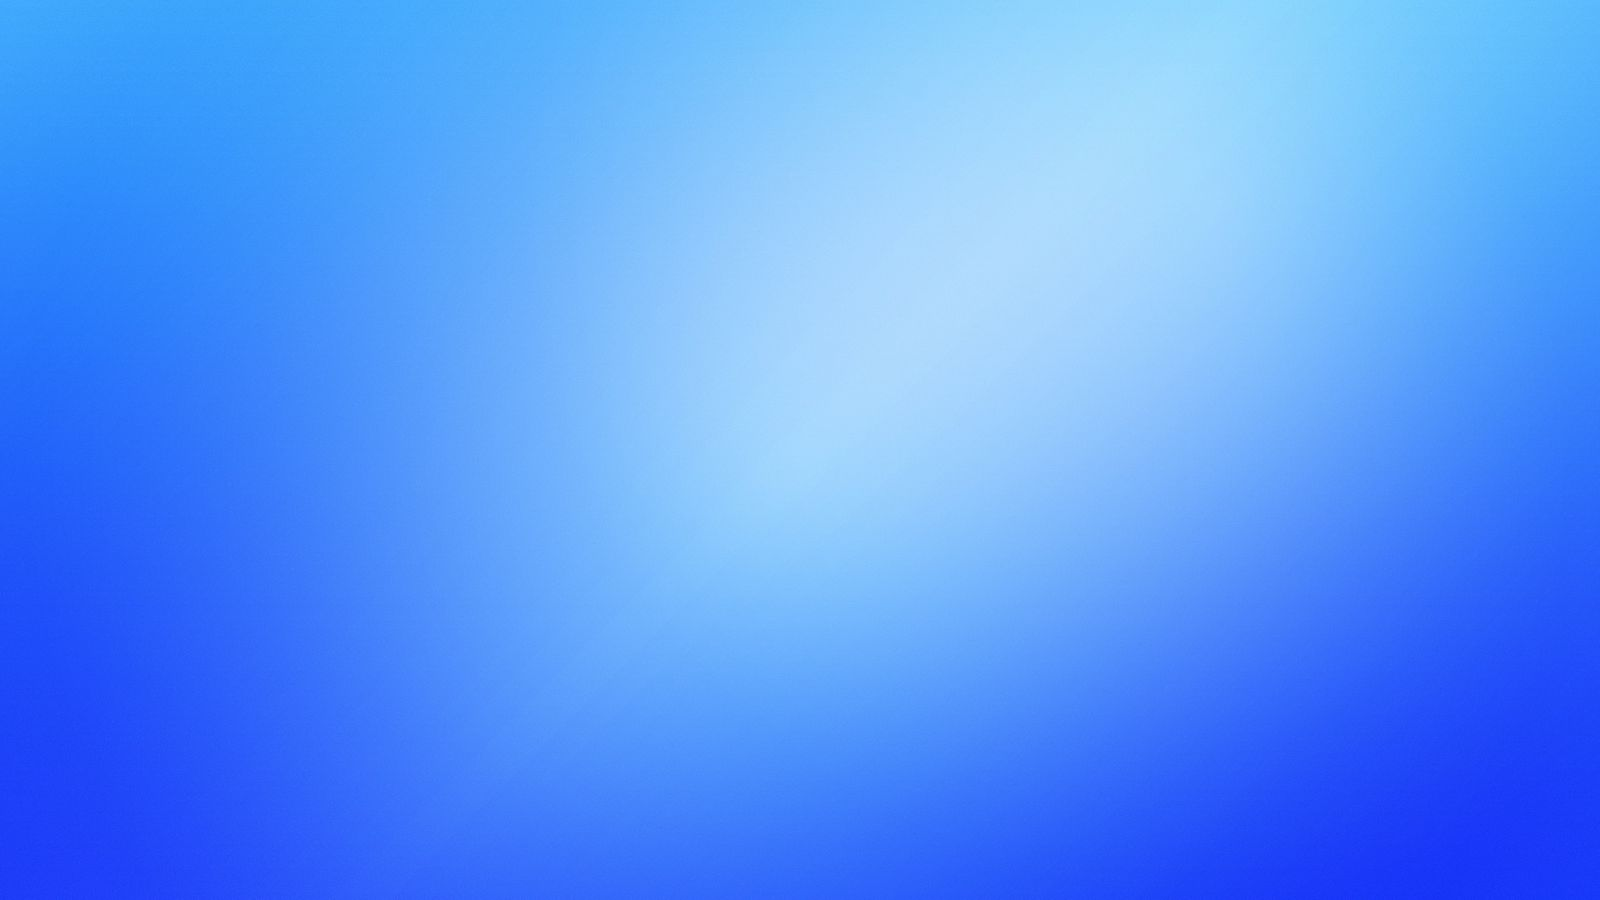 blurry_blue